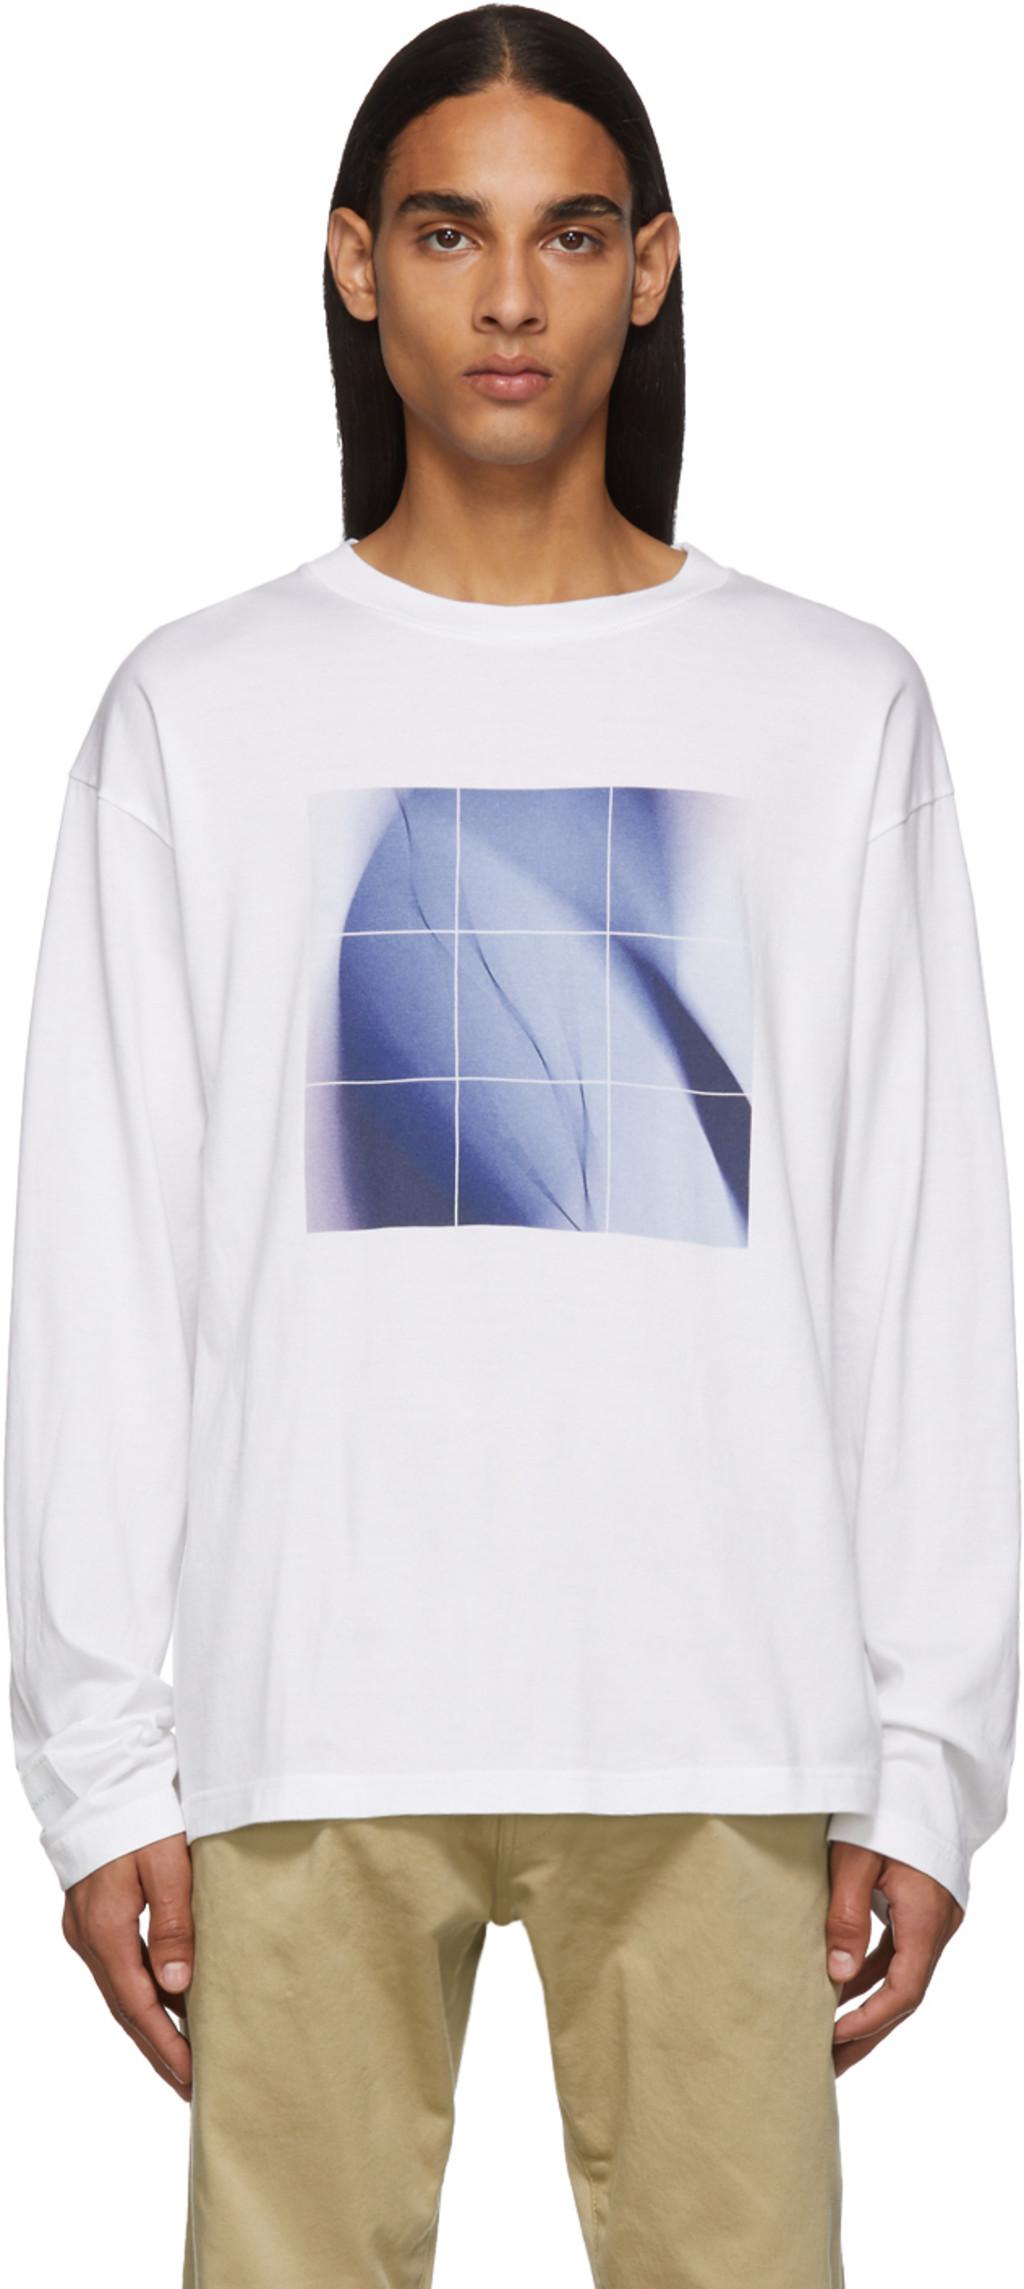 d9110d16c3 White & Blue Graphic Long Sleeve T-Shirt